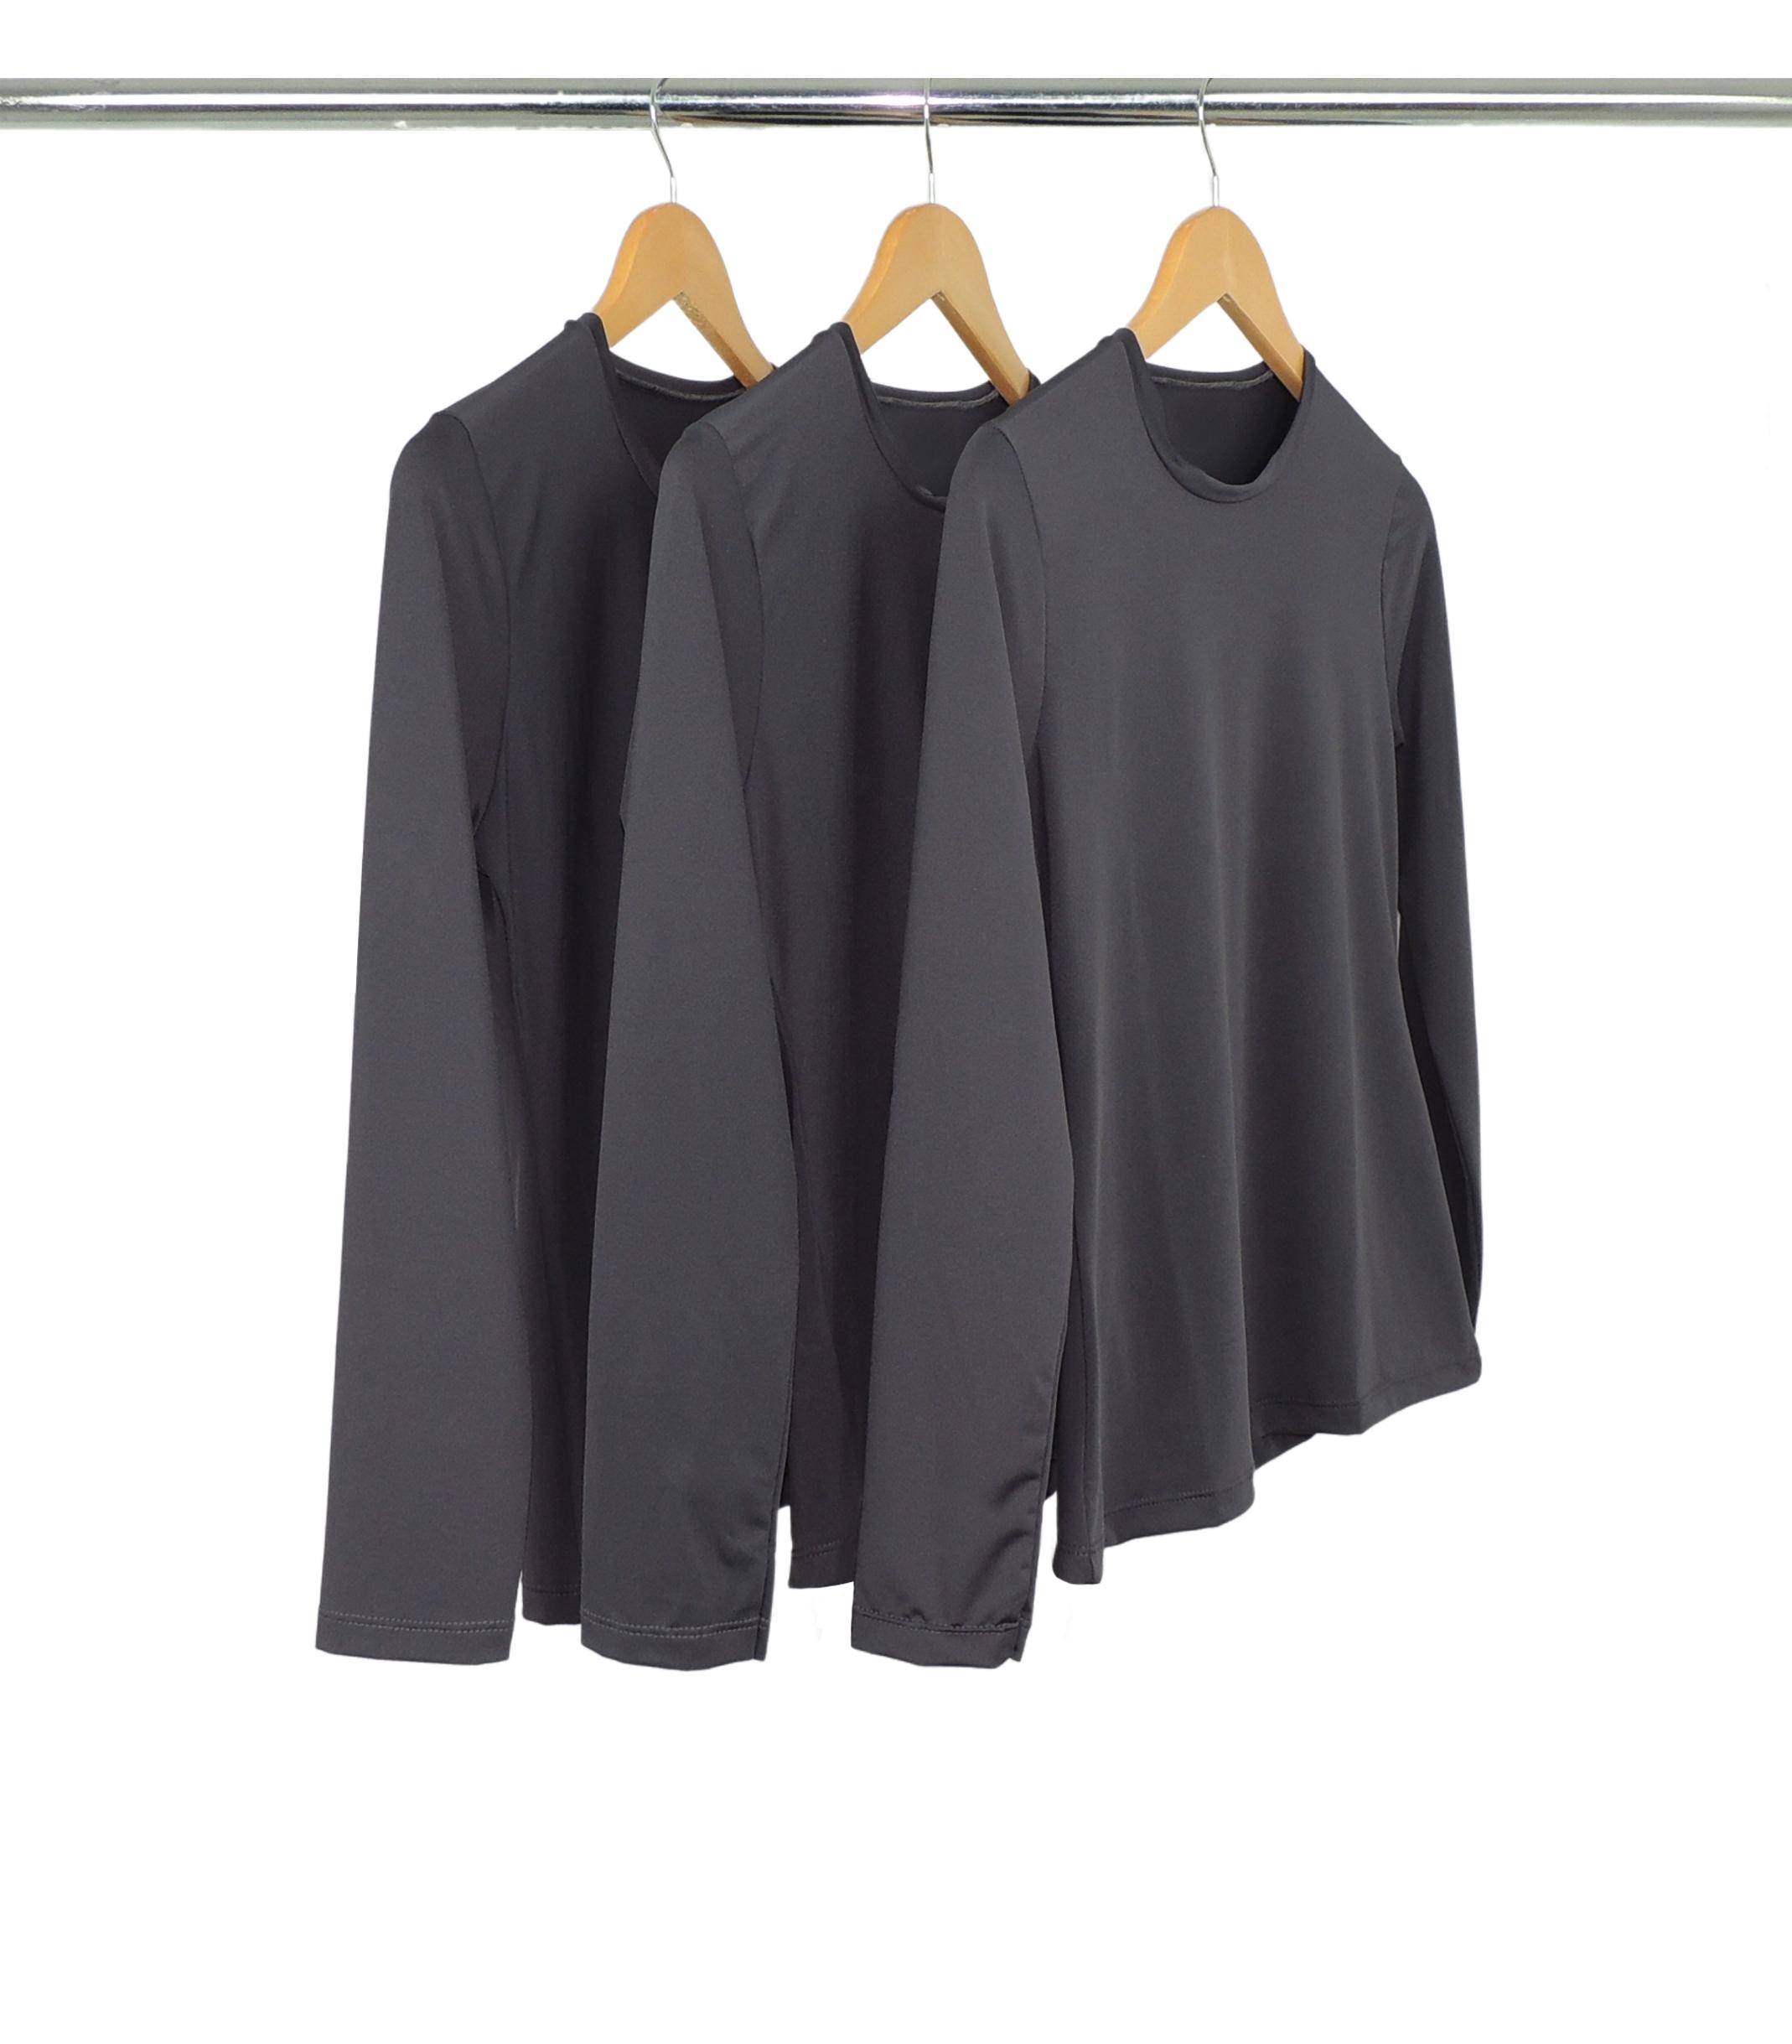 Kit 5 Camisetas Segunda Pele Manga Longa Feminina Cinza Chumbo UV 50+